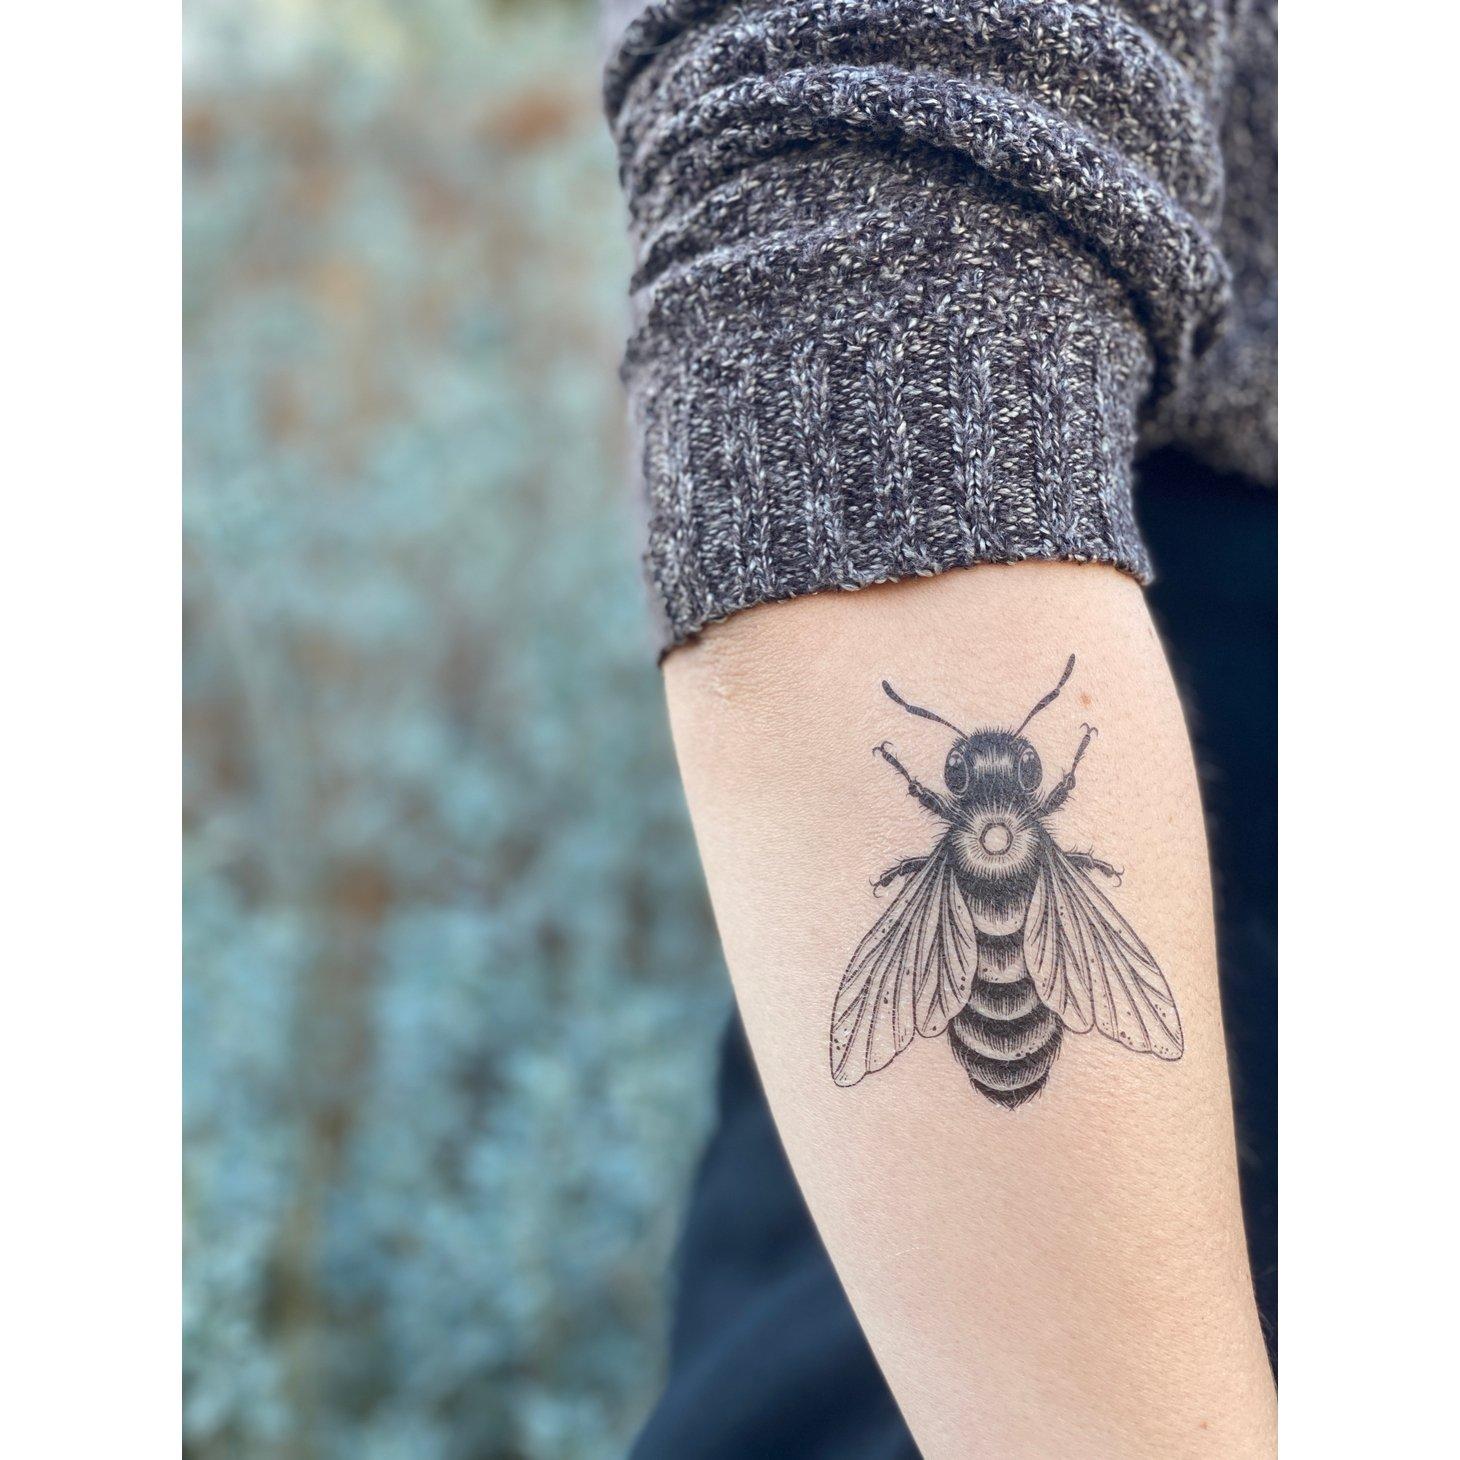 Nature Temporary Tattoo